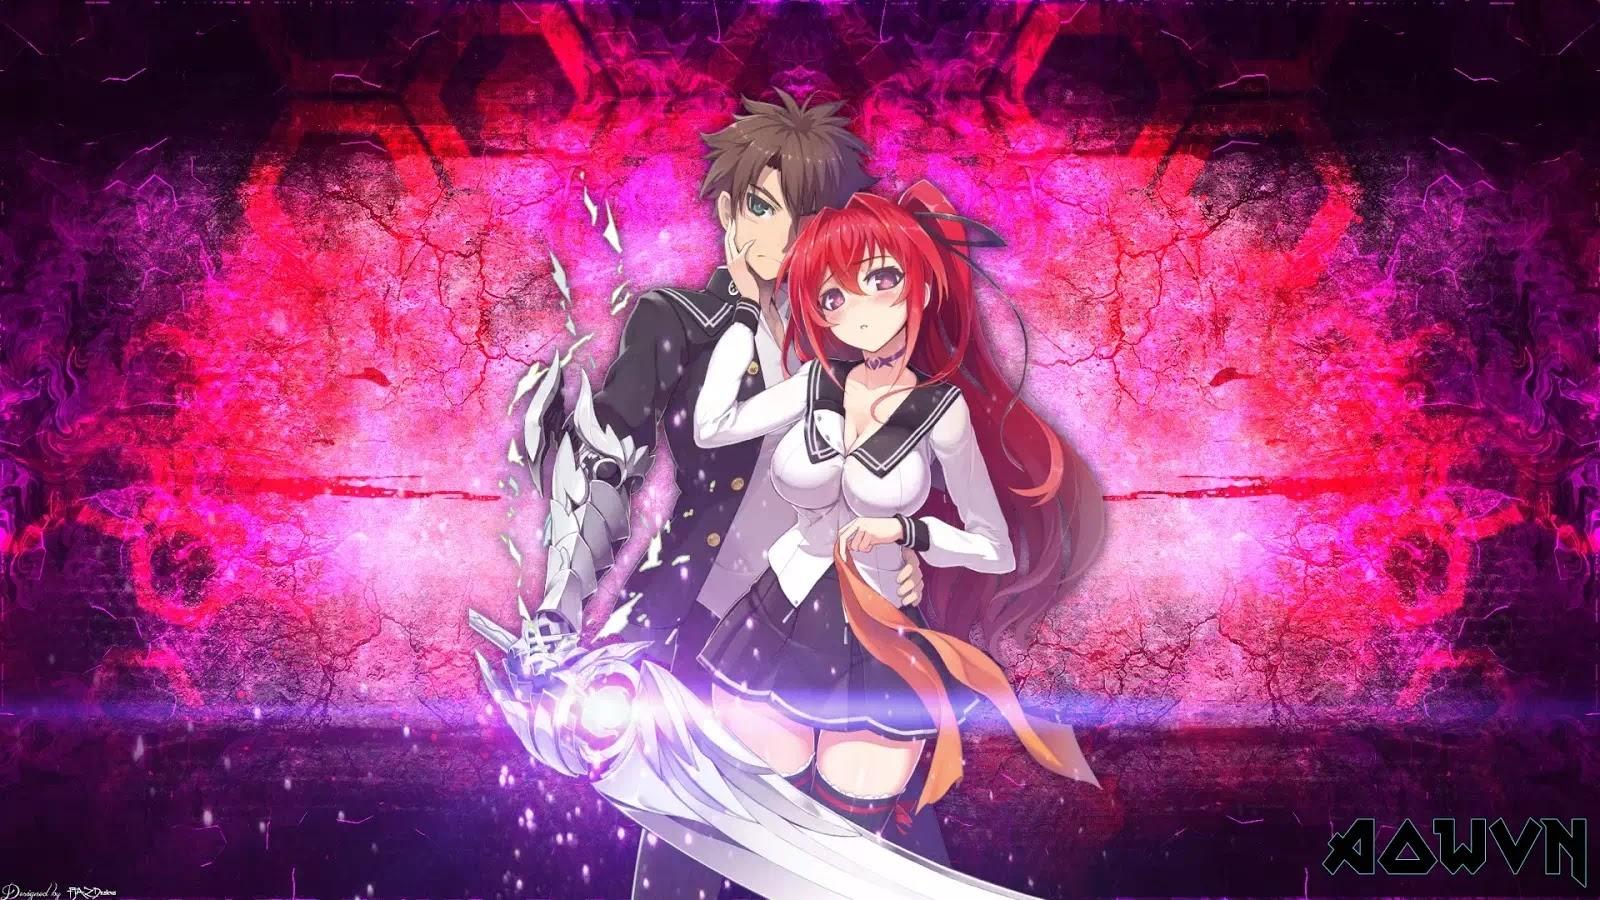 AowVN%2B%25281%2529 - [ Anime 3gp Mp4 ] Shinmai Maou no Testament BD SS1 + SS2 + OVA   Vietsub Ecchi Harem 17+